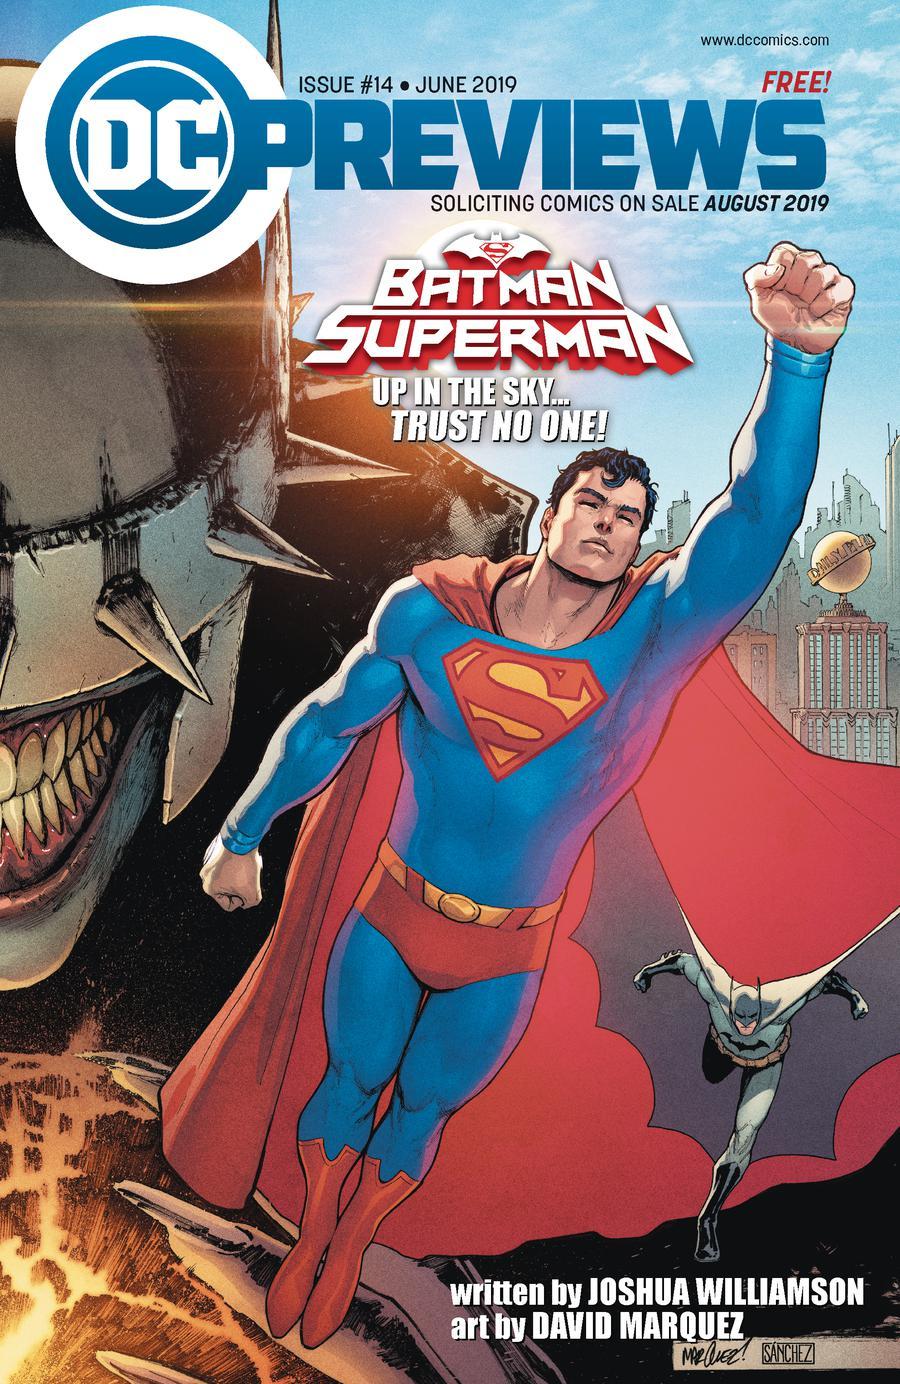 DC Previews #14 June 2019